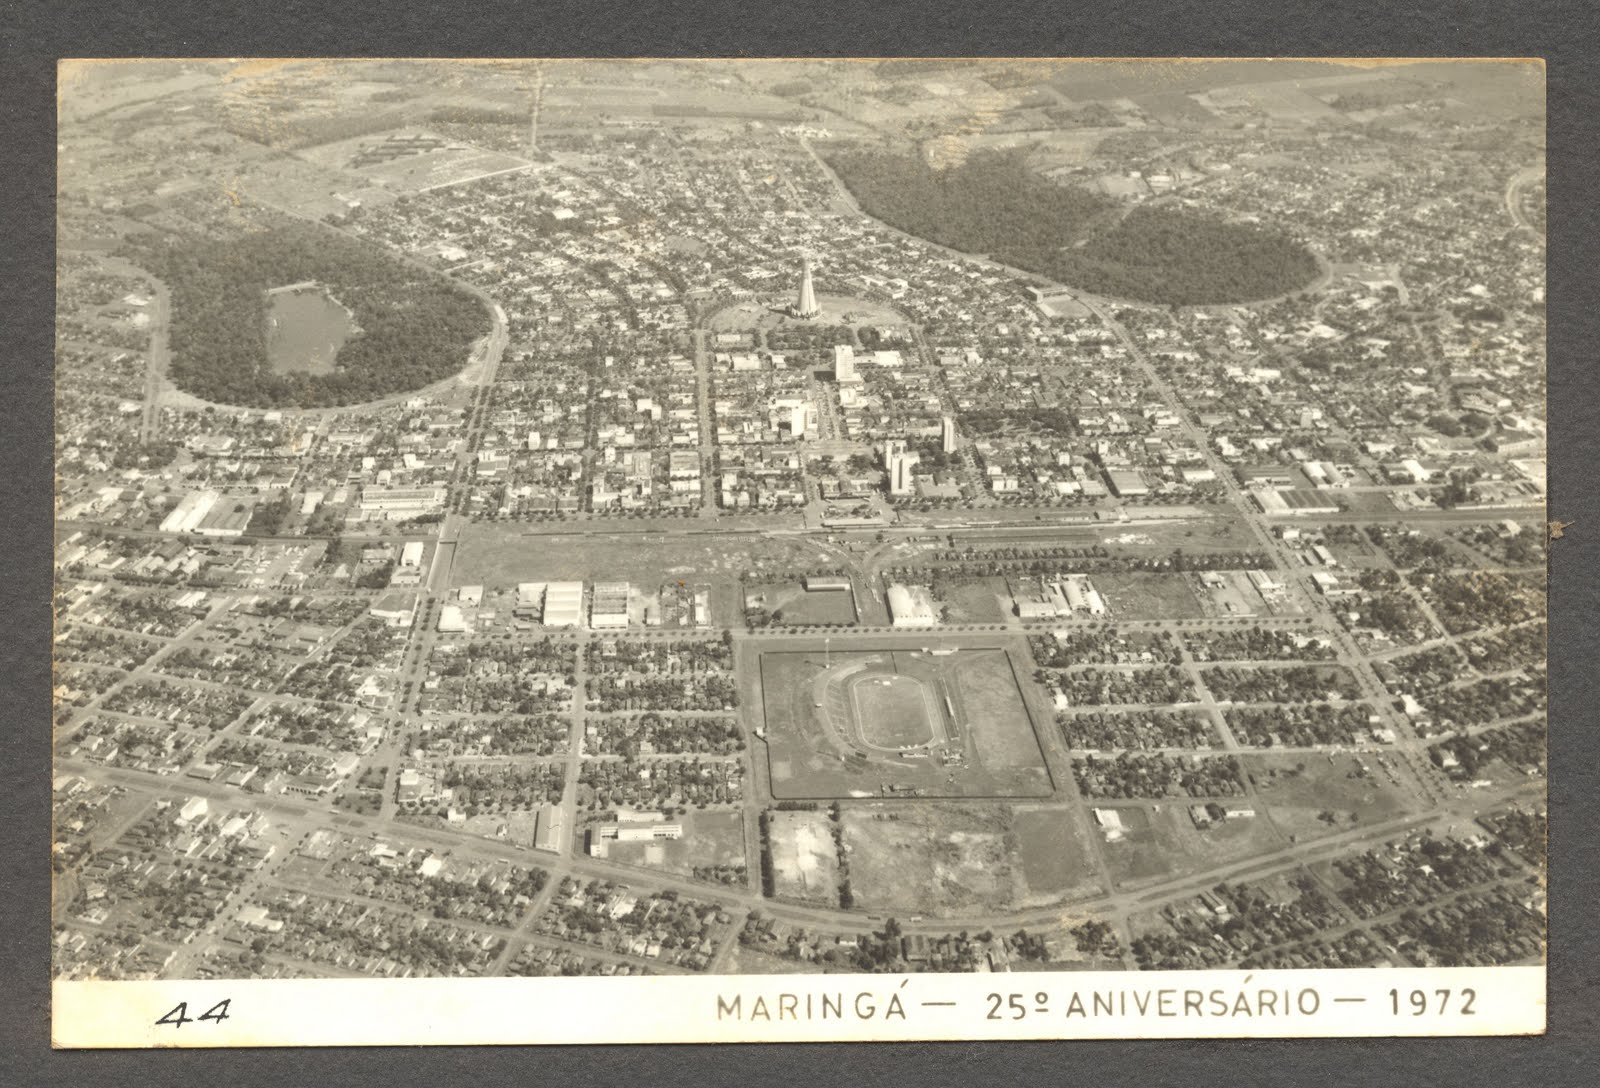 Os pulmões de Maringá - 1972